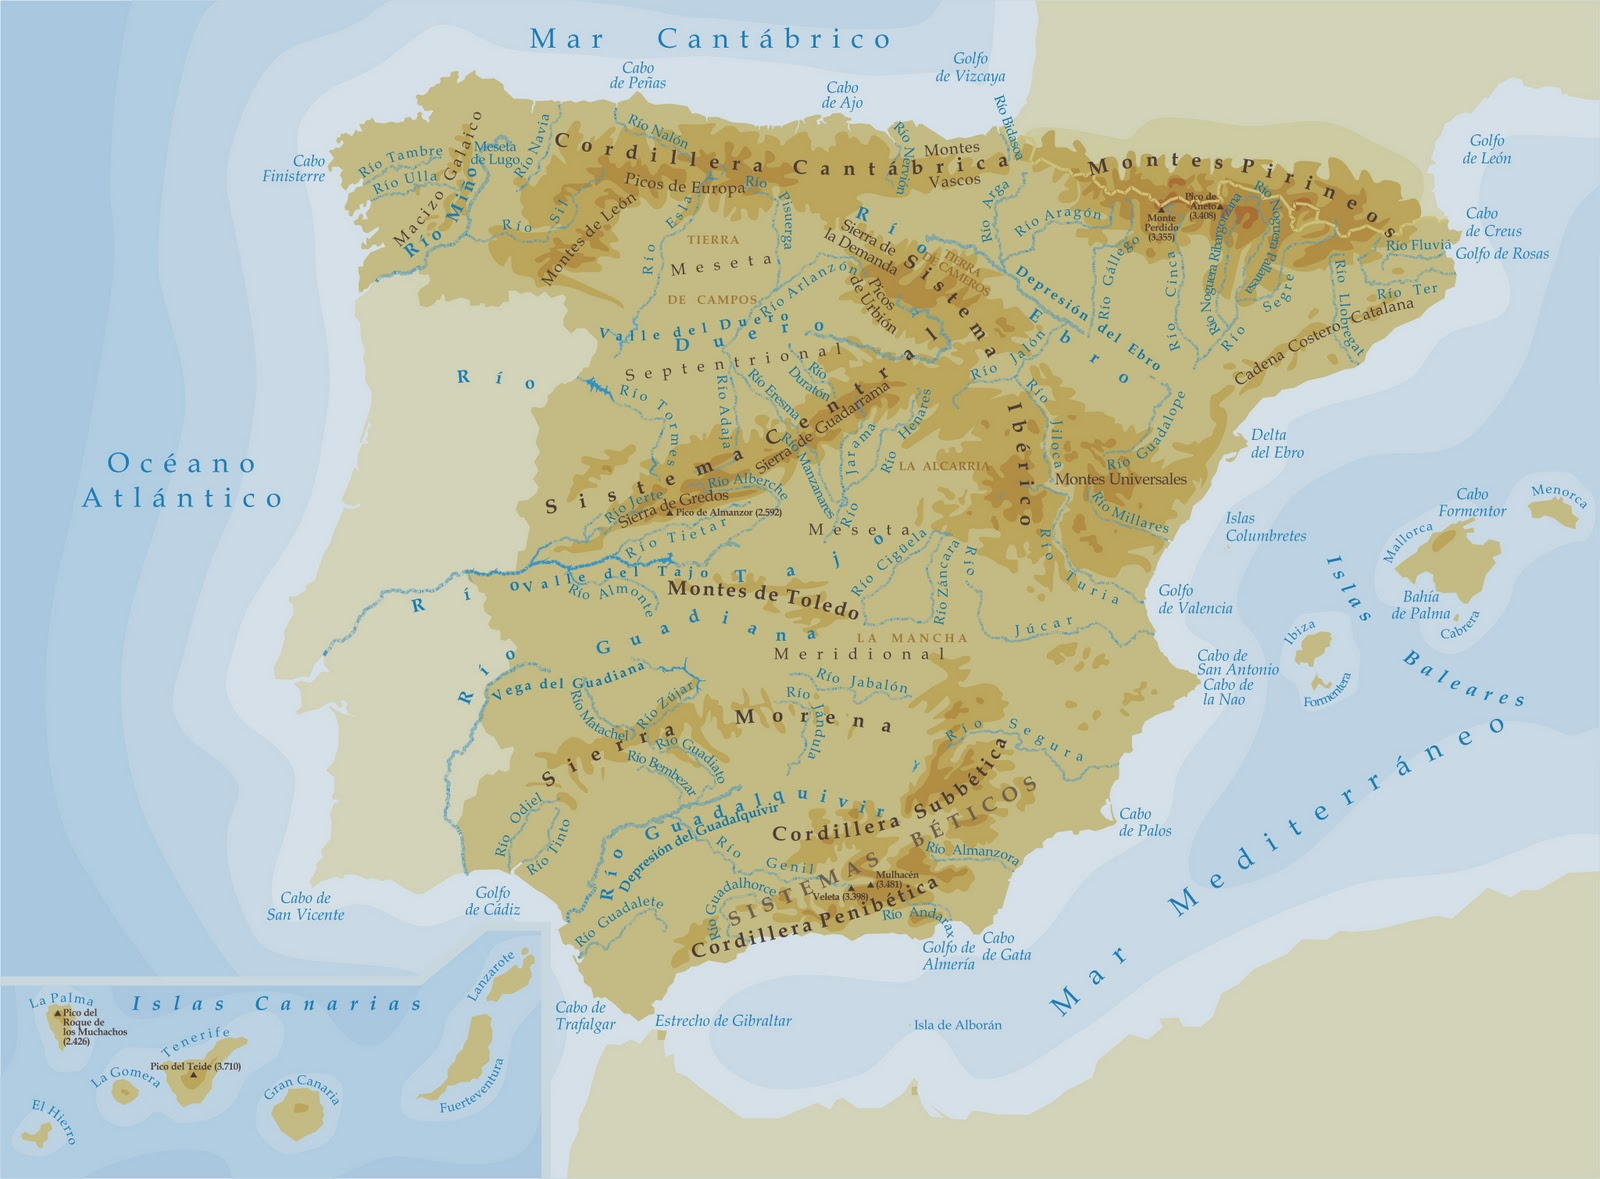 ingles espana: